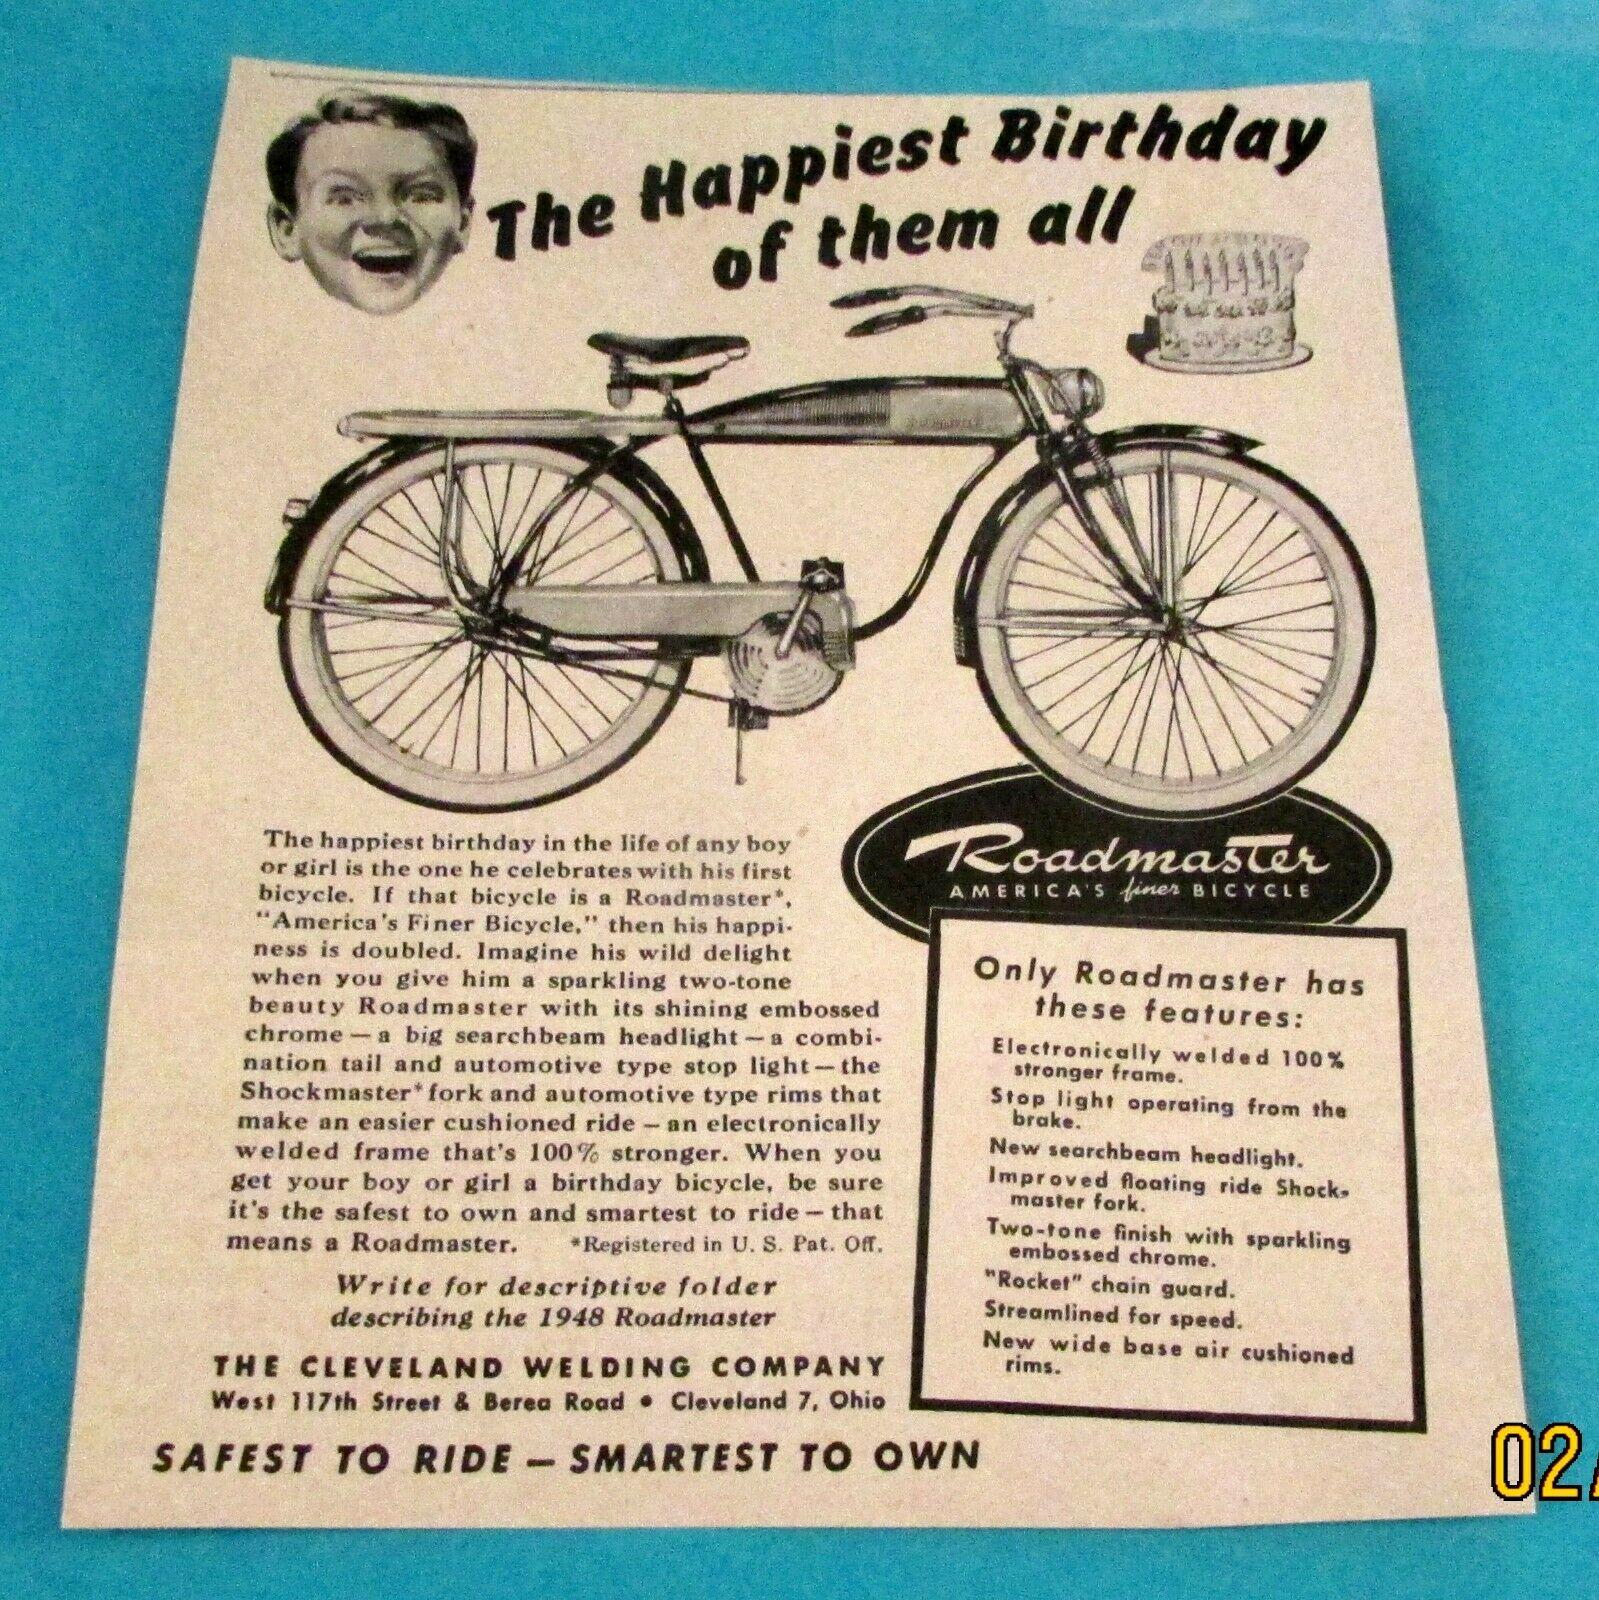 1948 March 15 ad from ebay seller 3girlsanddog.jpg